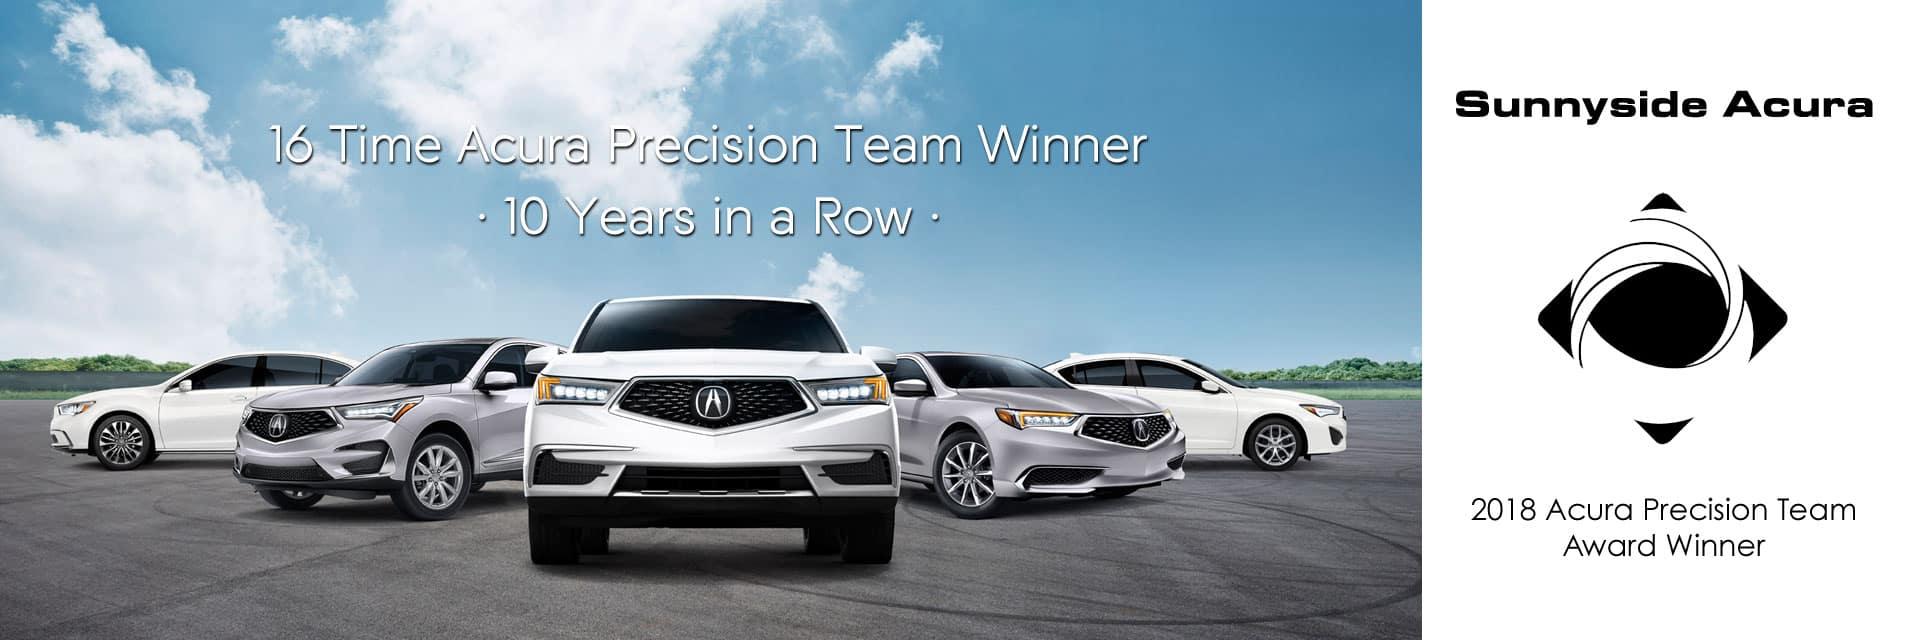 2018 Acura Precision Team Sunnyside Acura